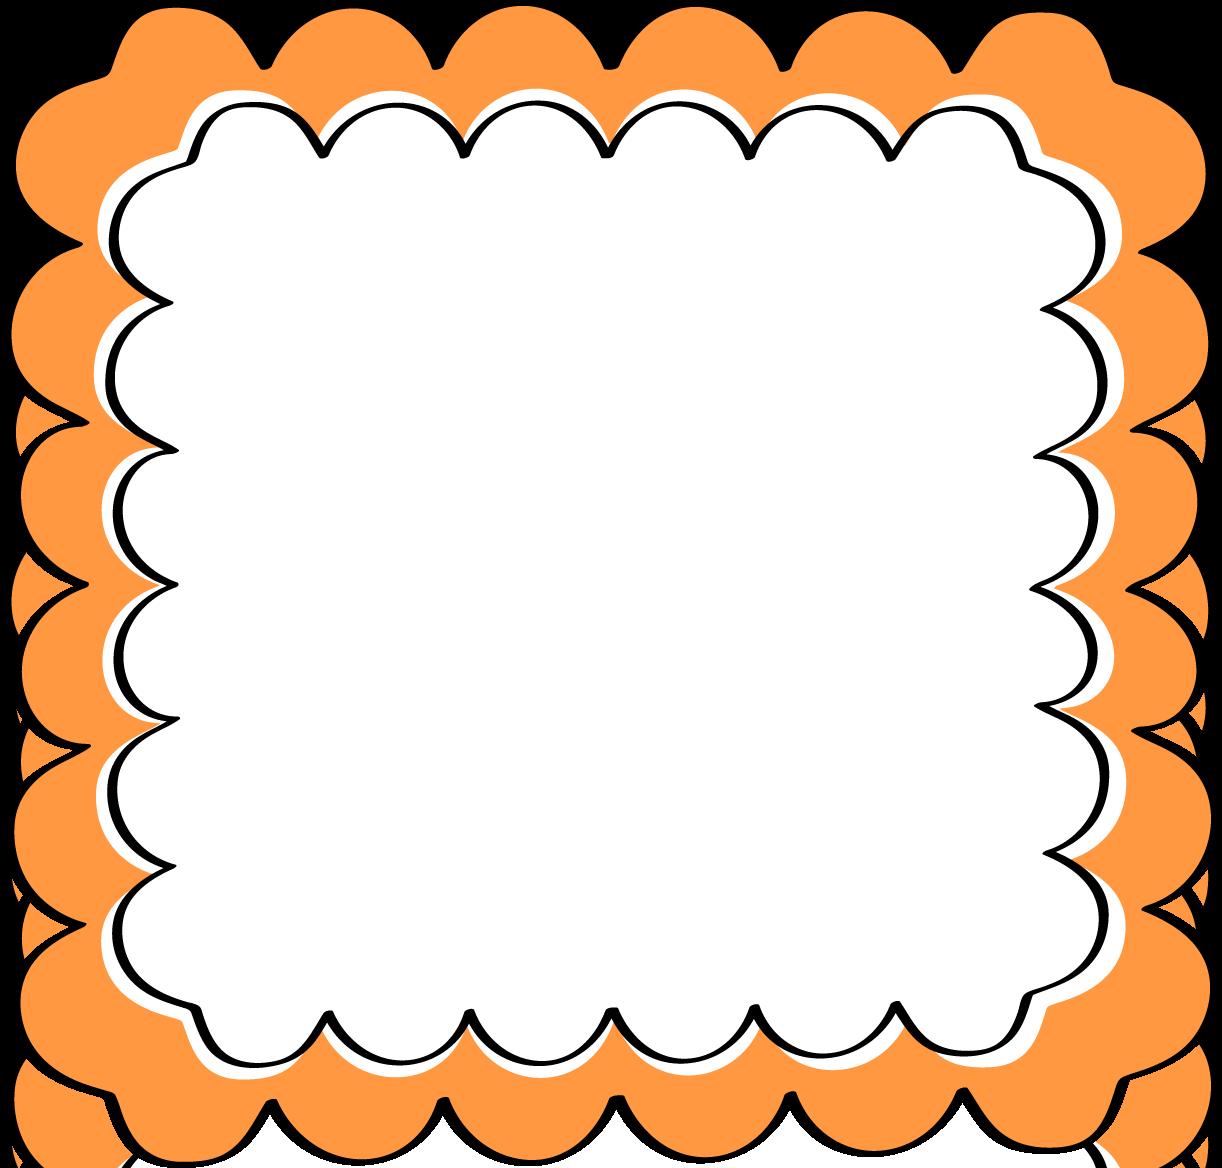 Frame clipart orange Scalloped Scalloped Free Orange Clip